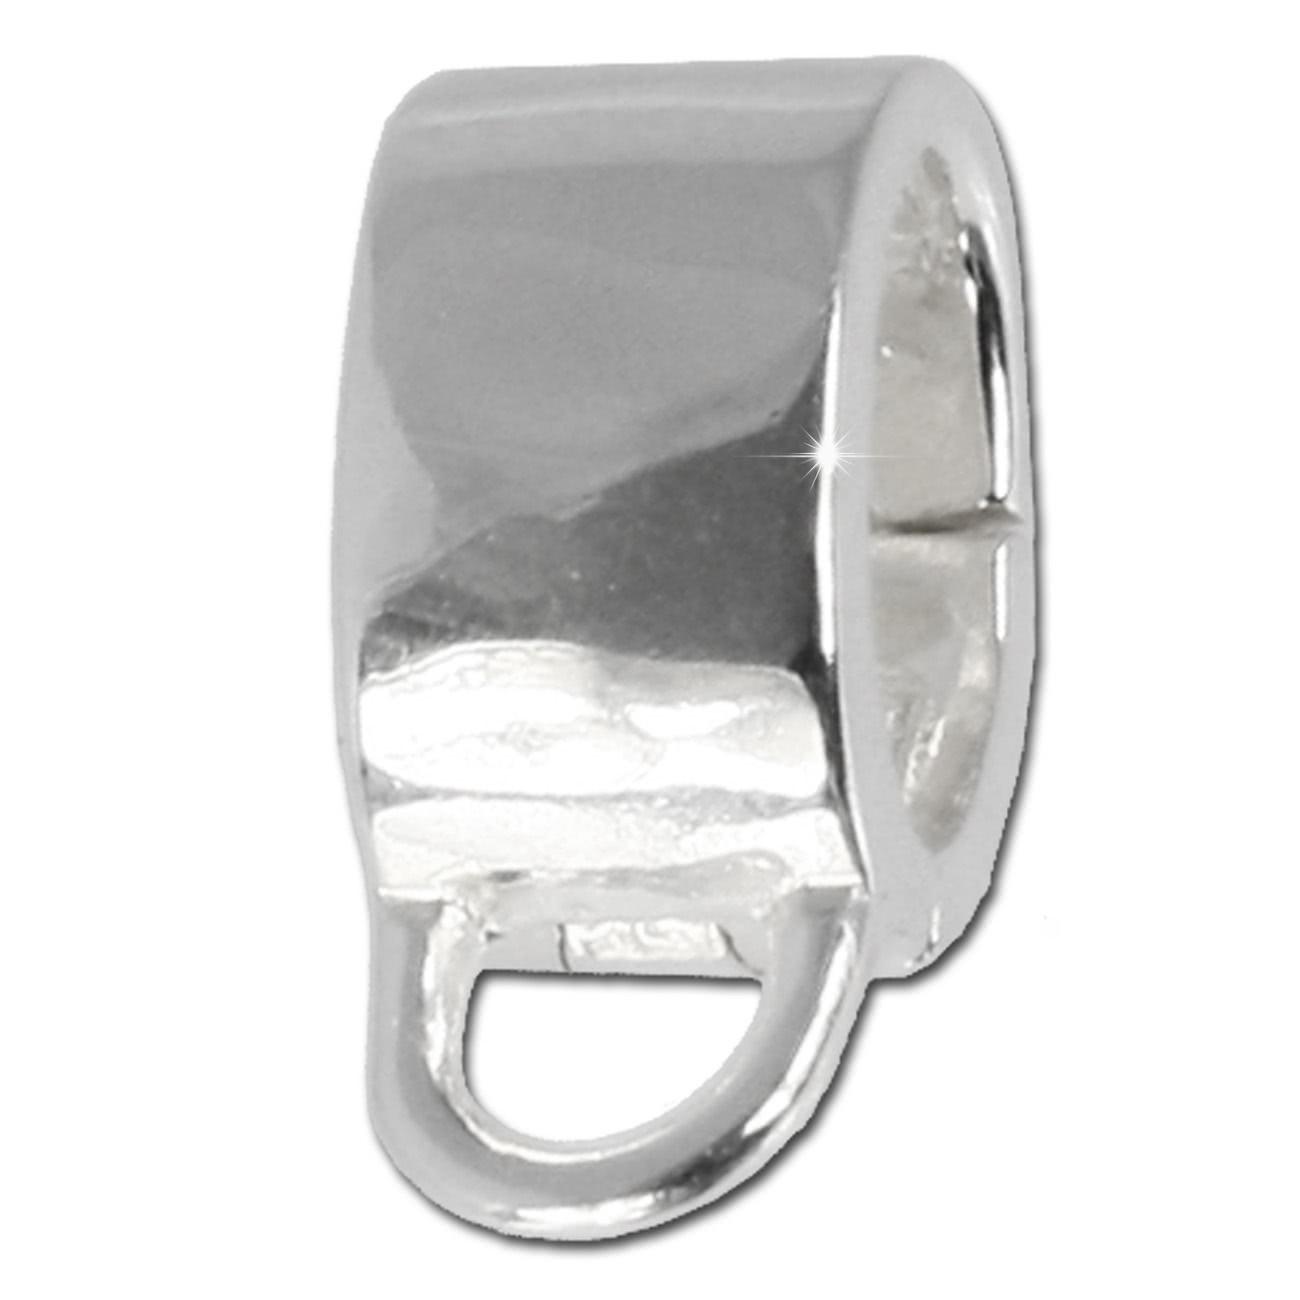 SilberDream Clip Silber für Charms an Nappa Leder Armband LS0100